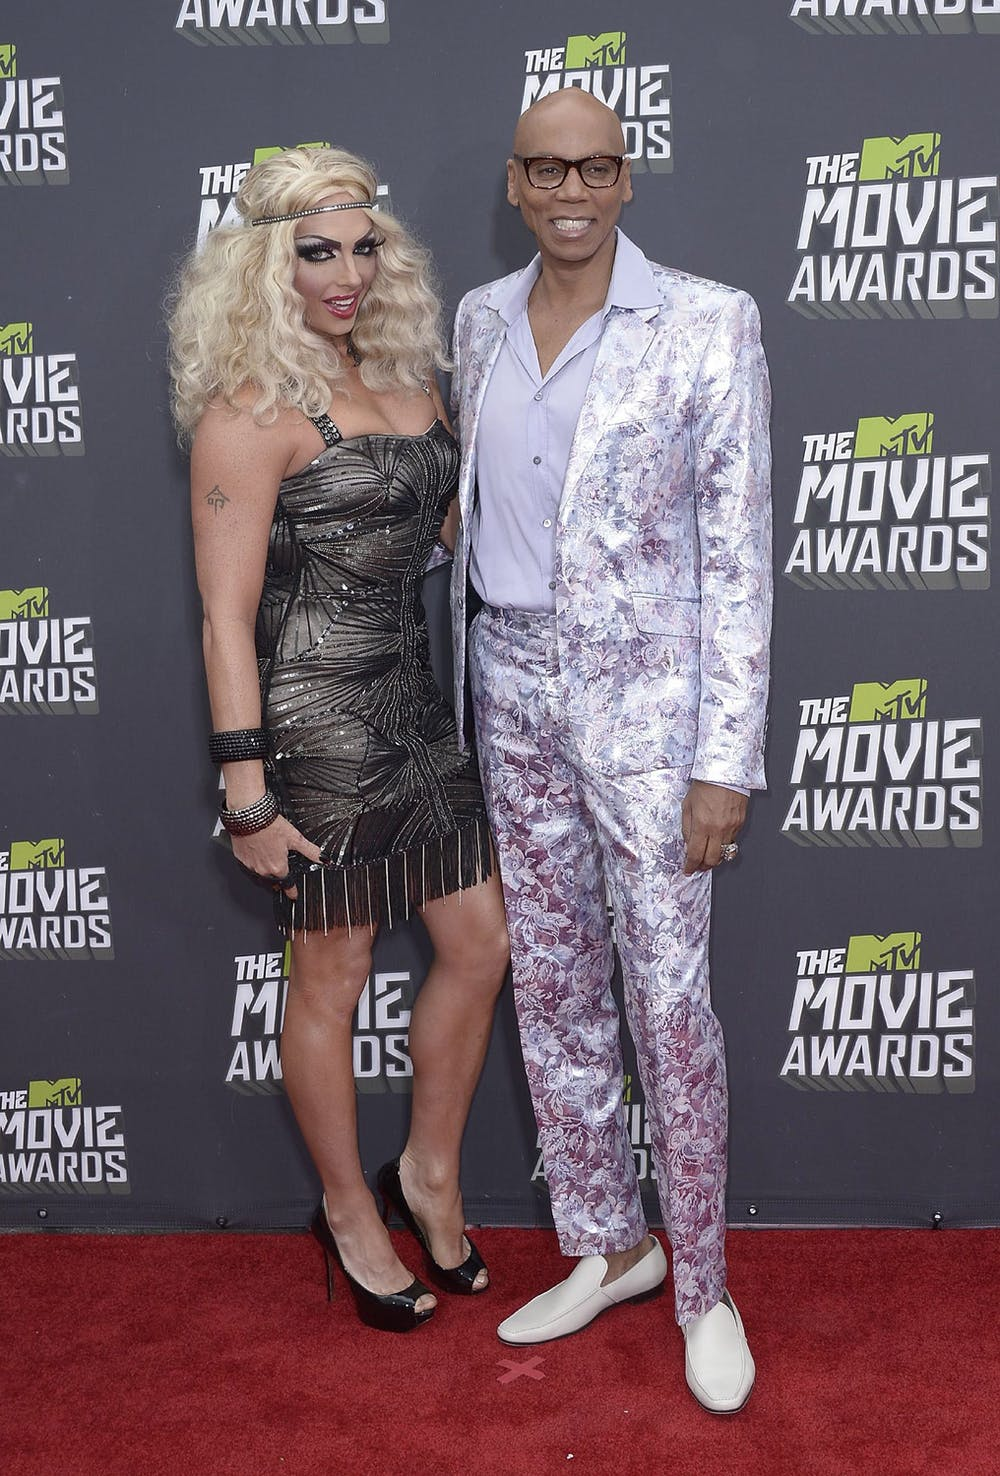 RuPaul (R) and drag personality Alyssa Edwards at 2013 MTV Movie Awards in  Culver City, California. EPA/ Paul Buck